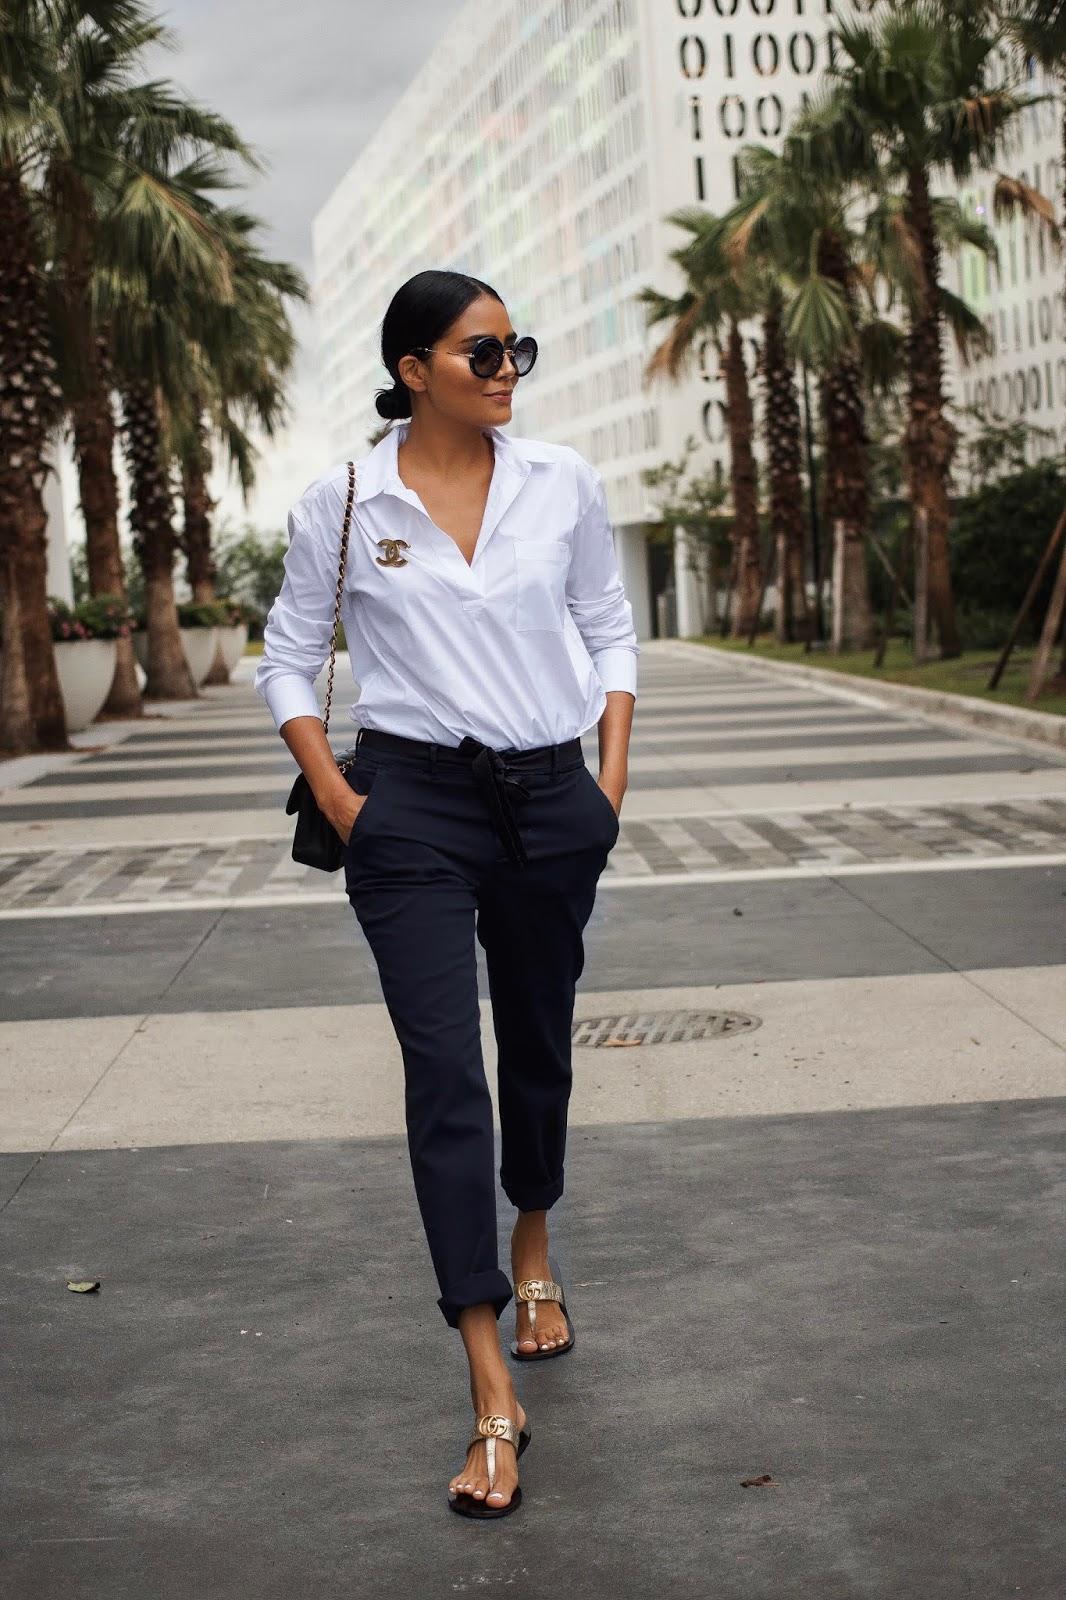 24c3cb89b4 A parisian in America by Alpa R | Orlando Fashion Blogger: Get your ...